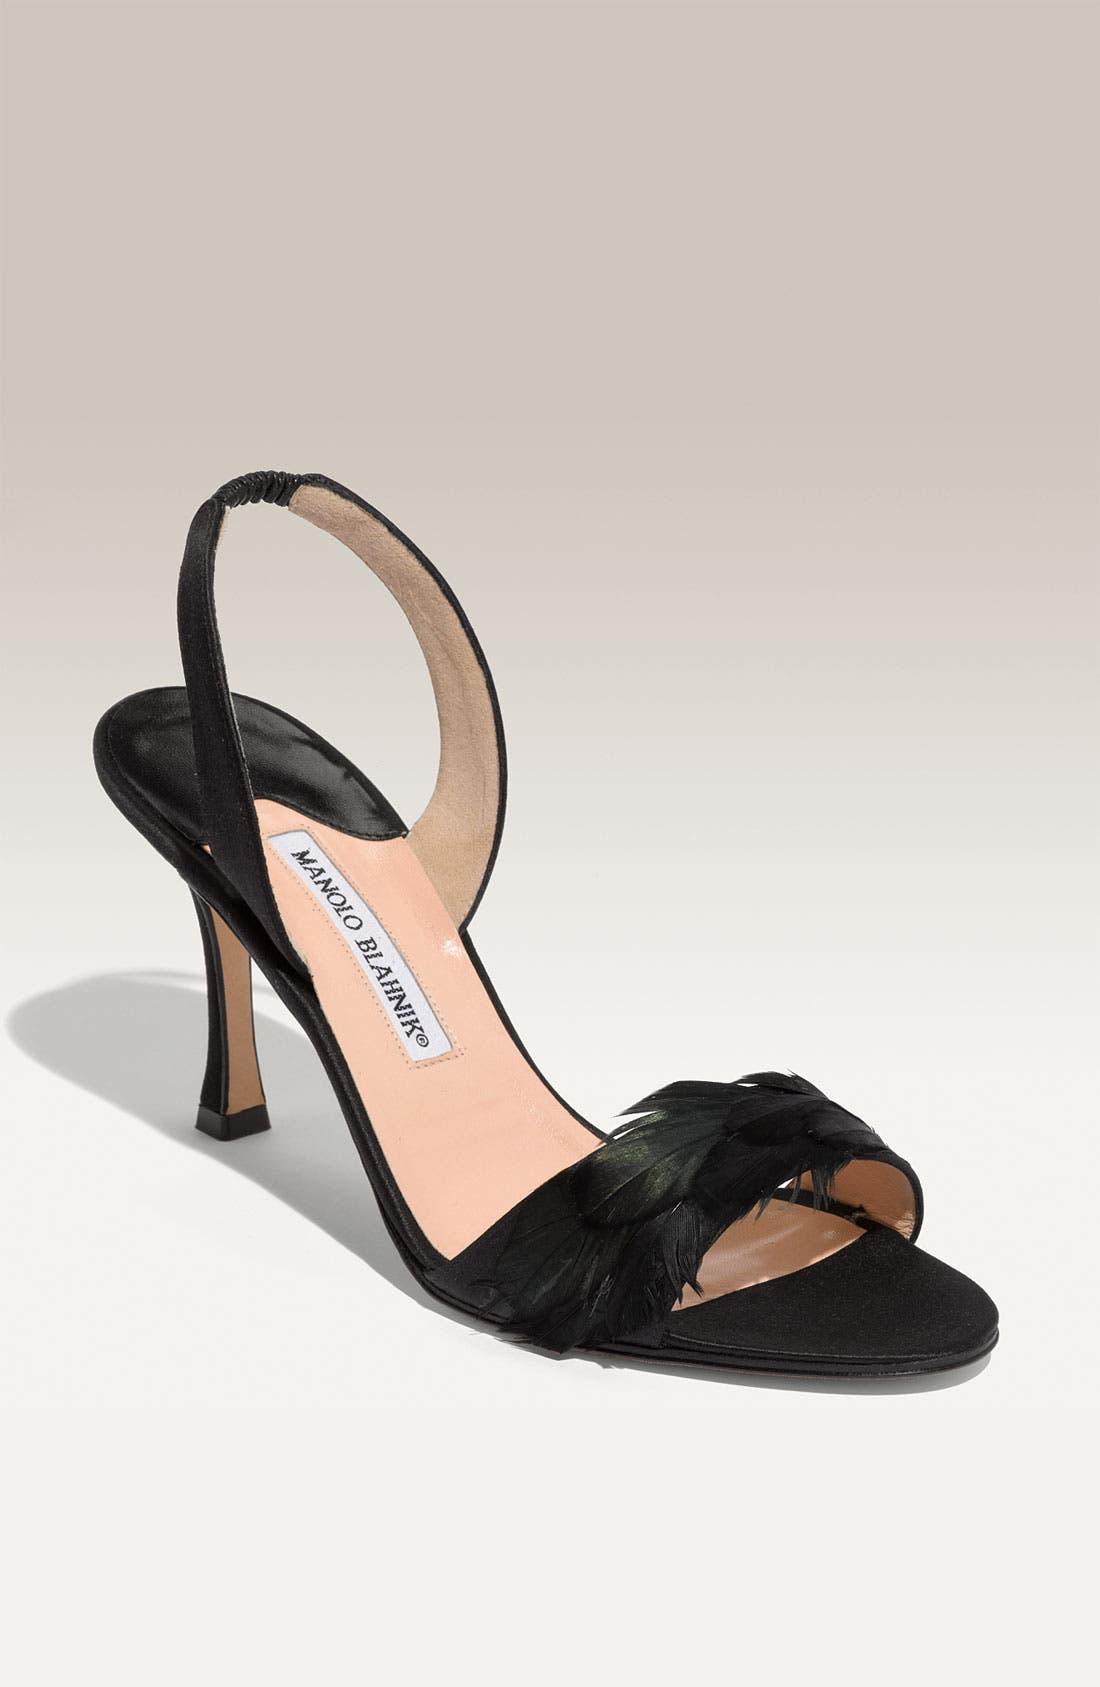 Main Image - Manolo Blahnik 'Catalinasli' Sandal